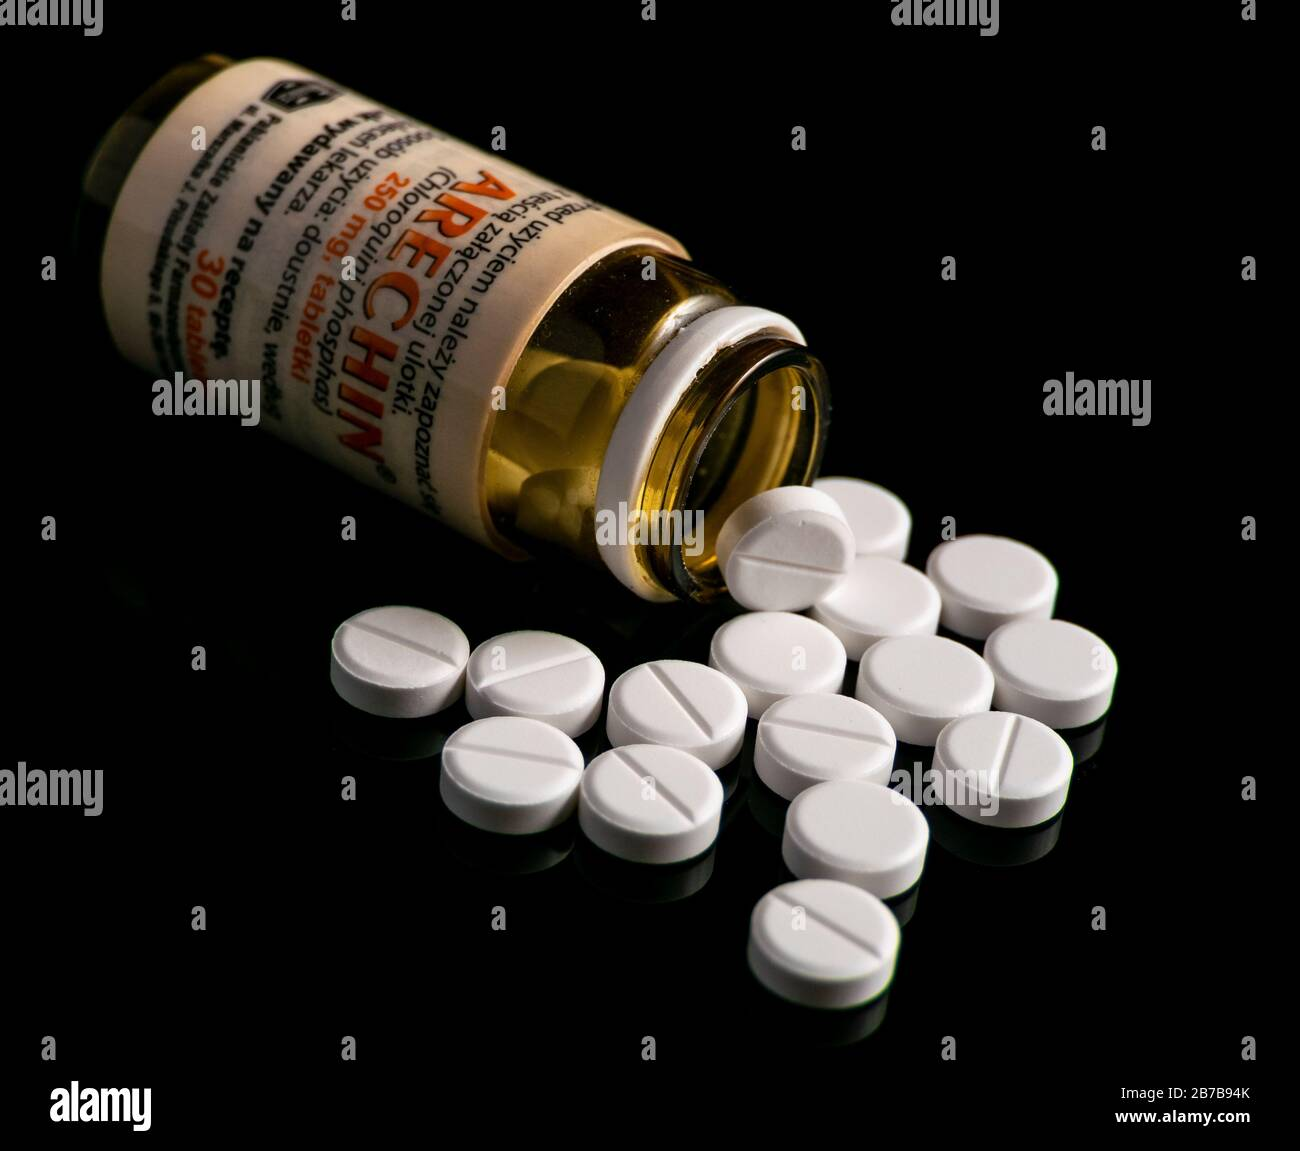 comprar cloroquina 250mg drogas